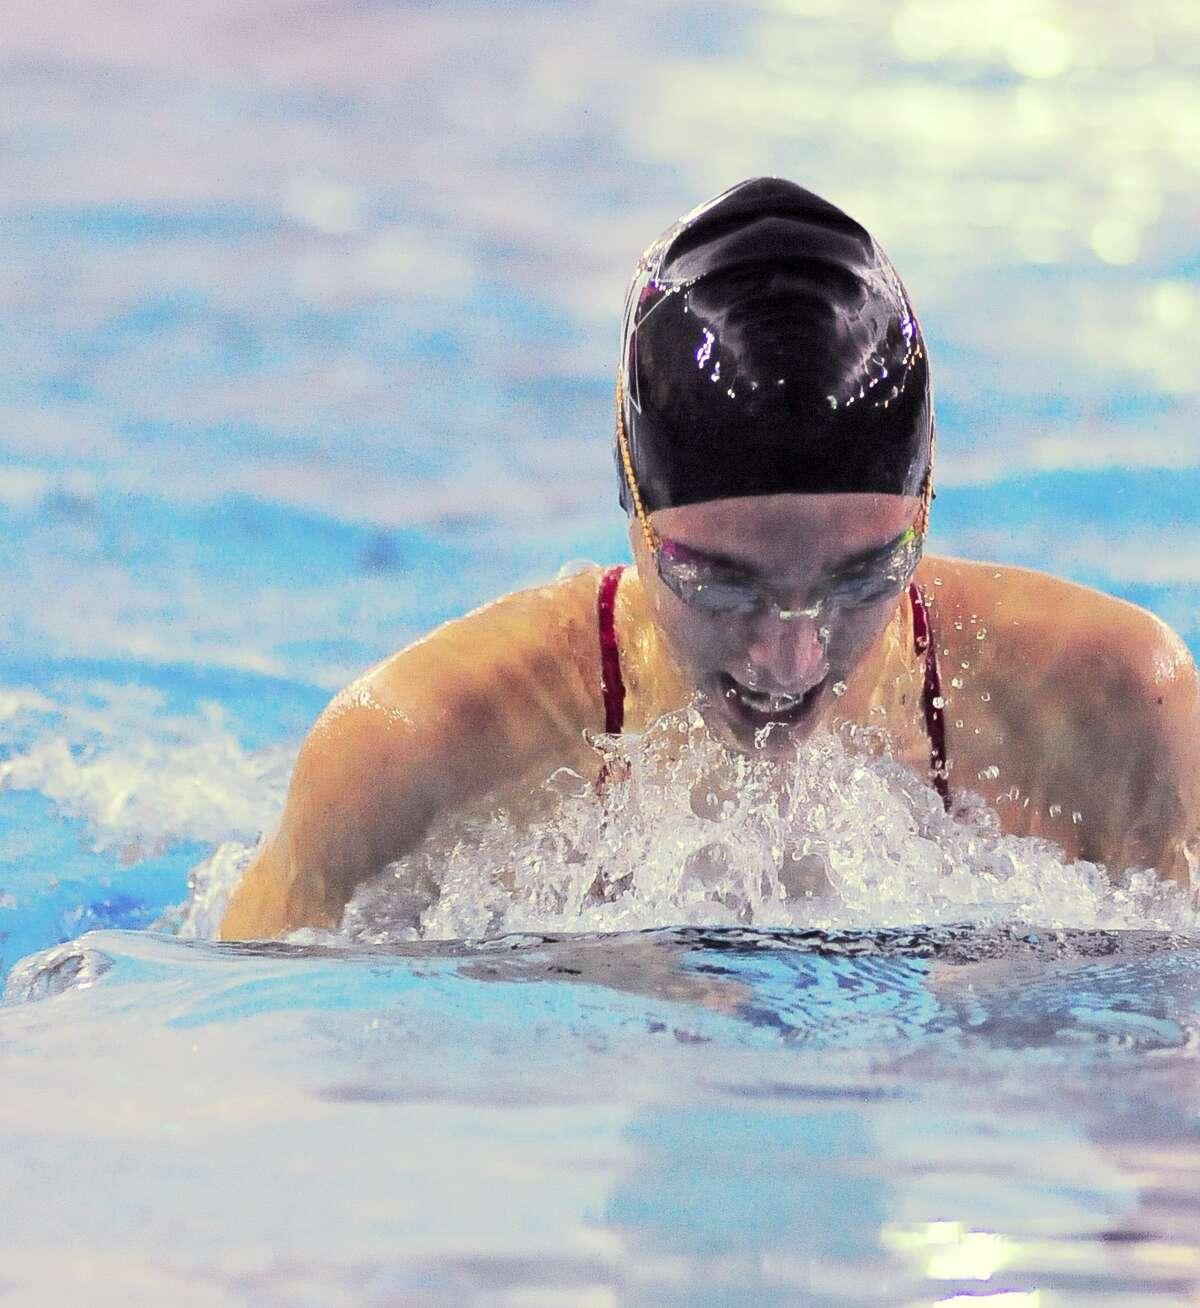 Elena Skaribas (junior at St. John's) competes in the Girls 100 Yard Breaststroke during the HAPPI Swimming and Diving Championships at Spring Branch Natatorium Saturday 01/25/14.